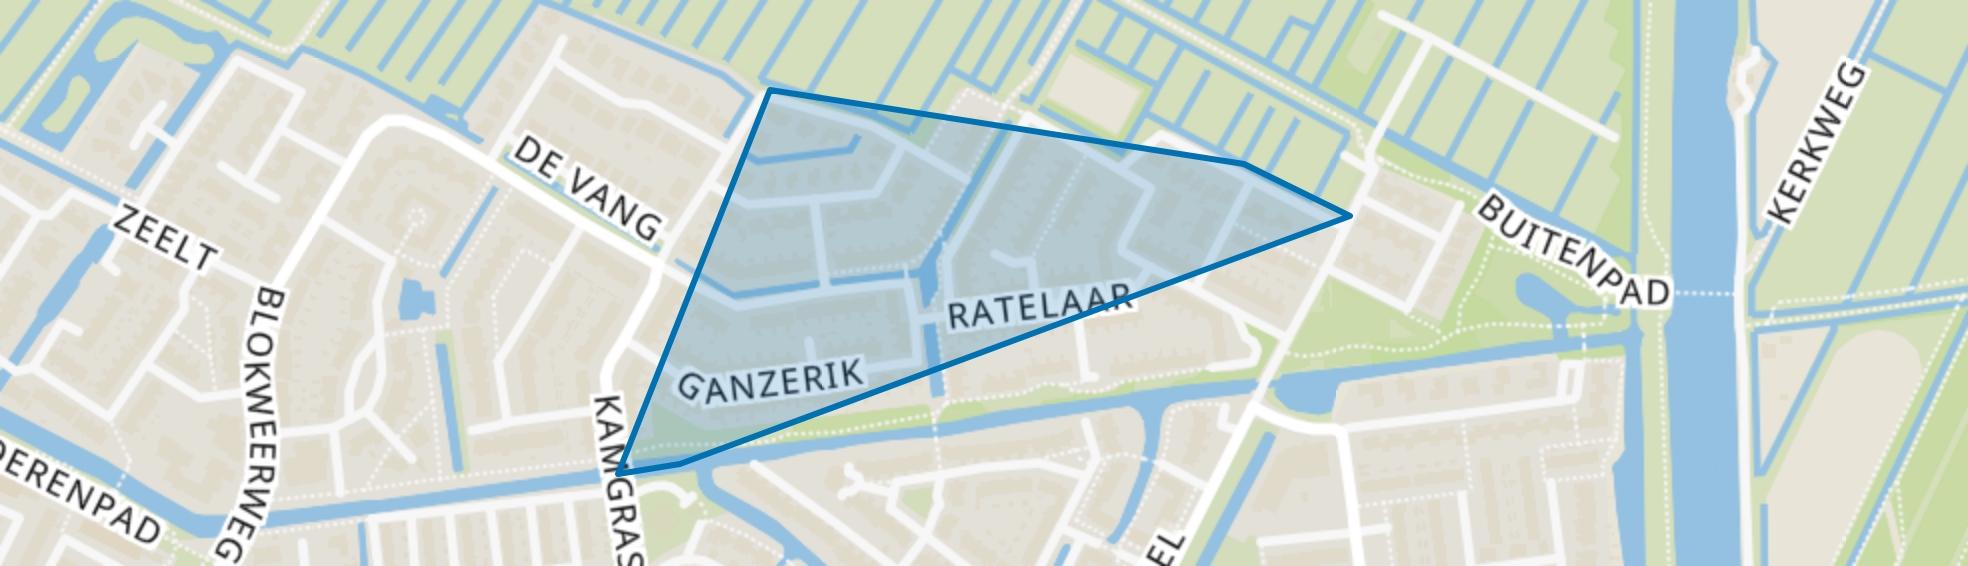 Blokweer Noord, Alblasserdam map